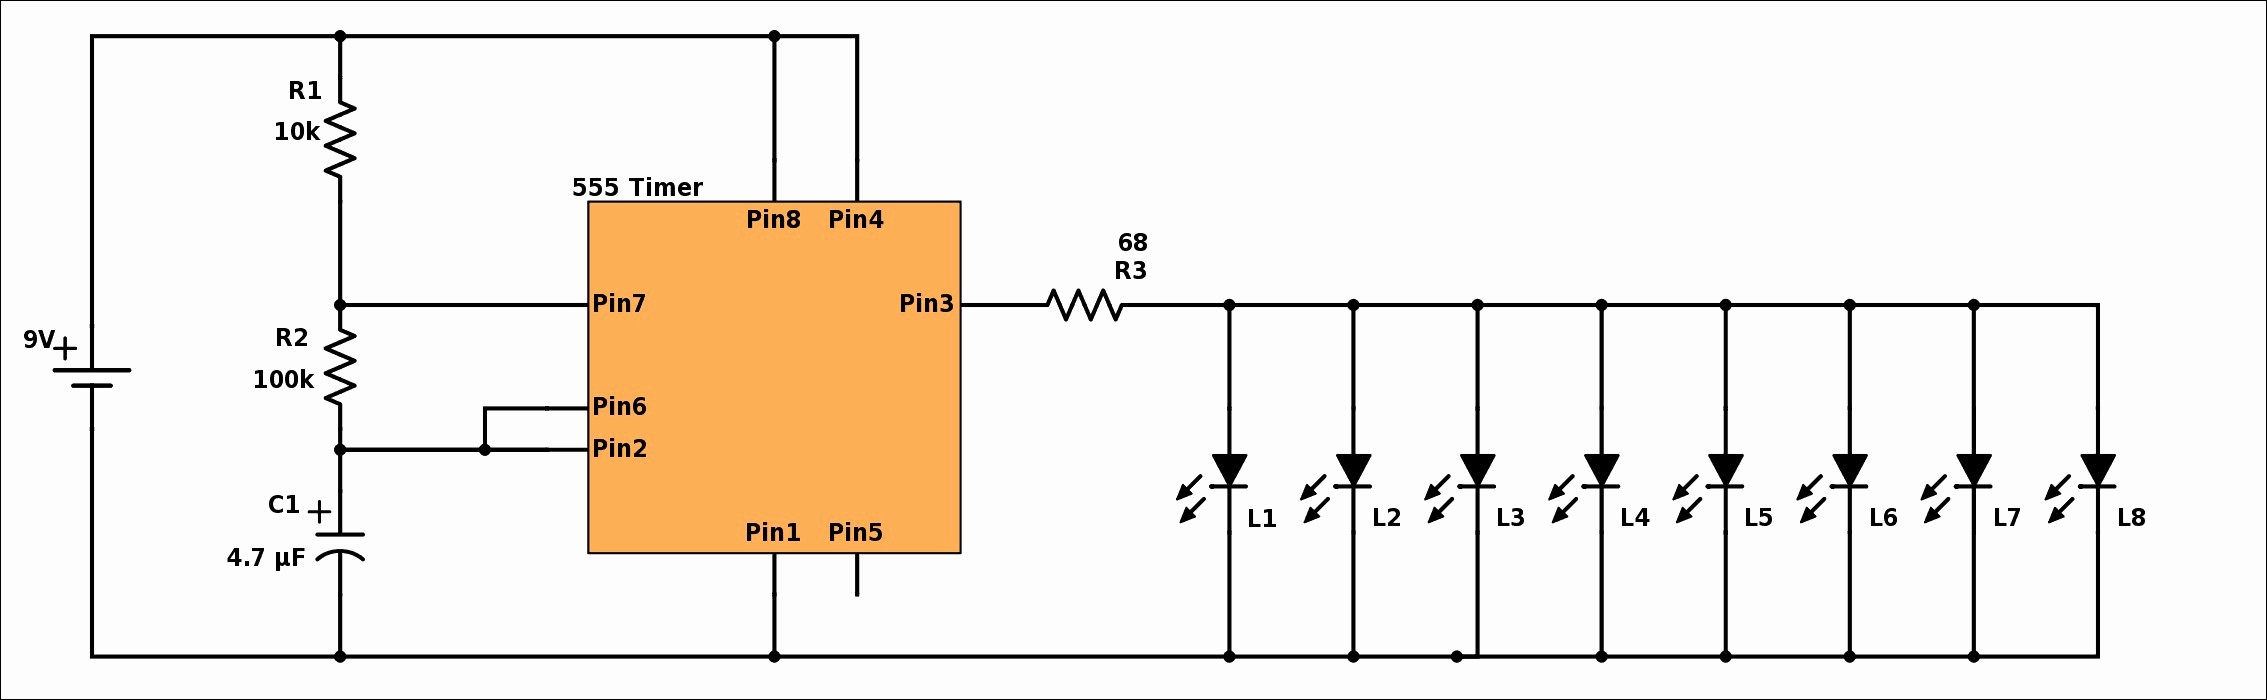 Pool Lighting Wiring Diagram Libraries Light Christmas Lights 12v Data Diagramlight Diagrams Likewise 3